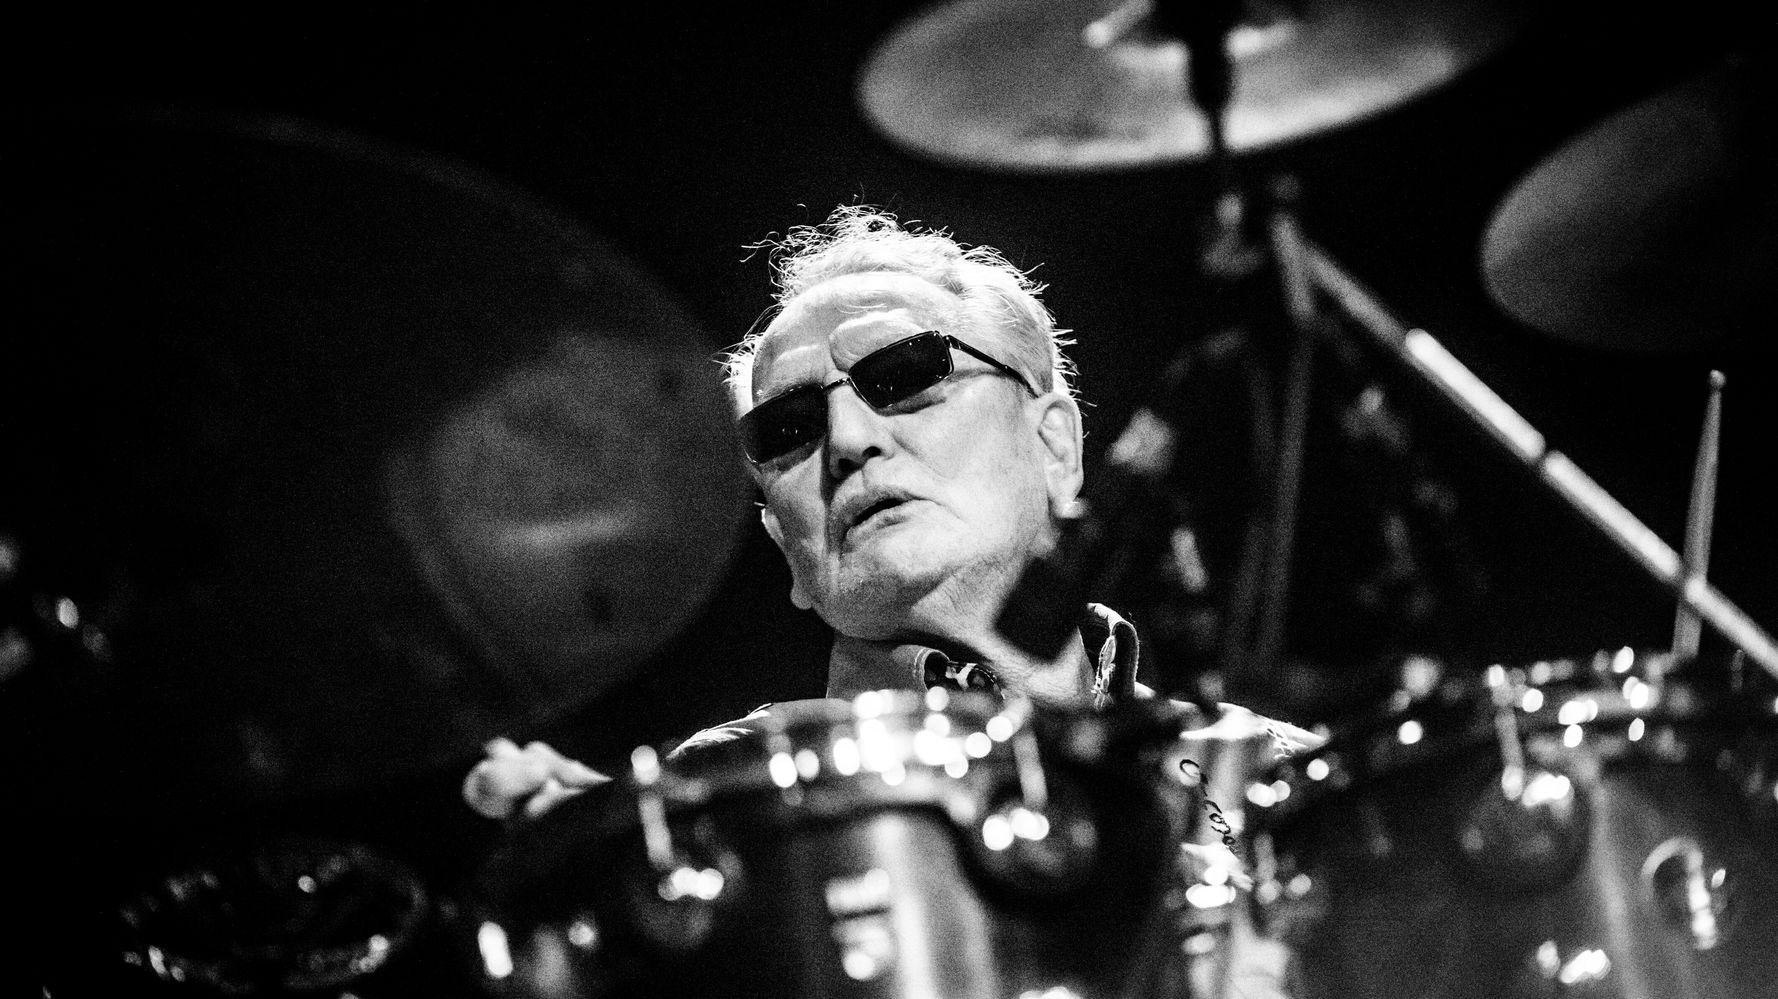 Westlake Legal Group 5d99d18d2100002e04321706 Ginger Baker, Cream's Legendary And Fiery Drummer, Dies At 80